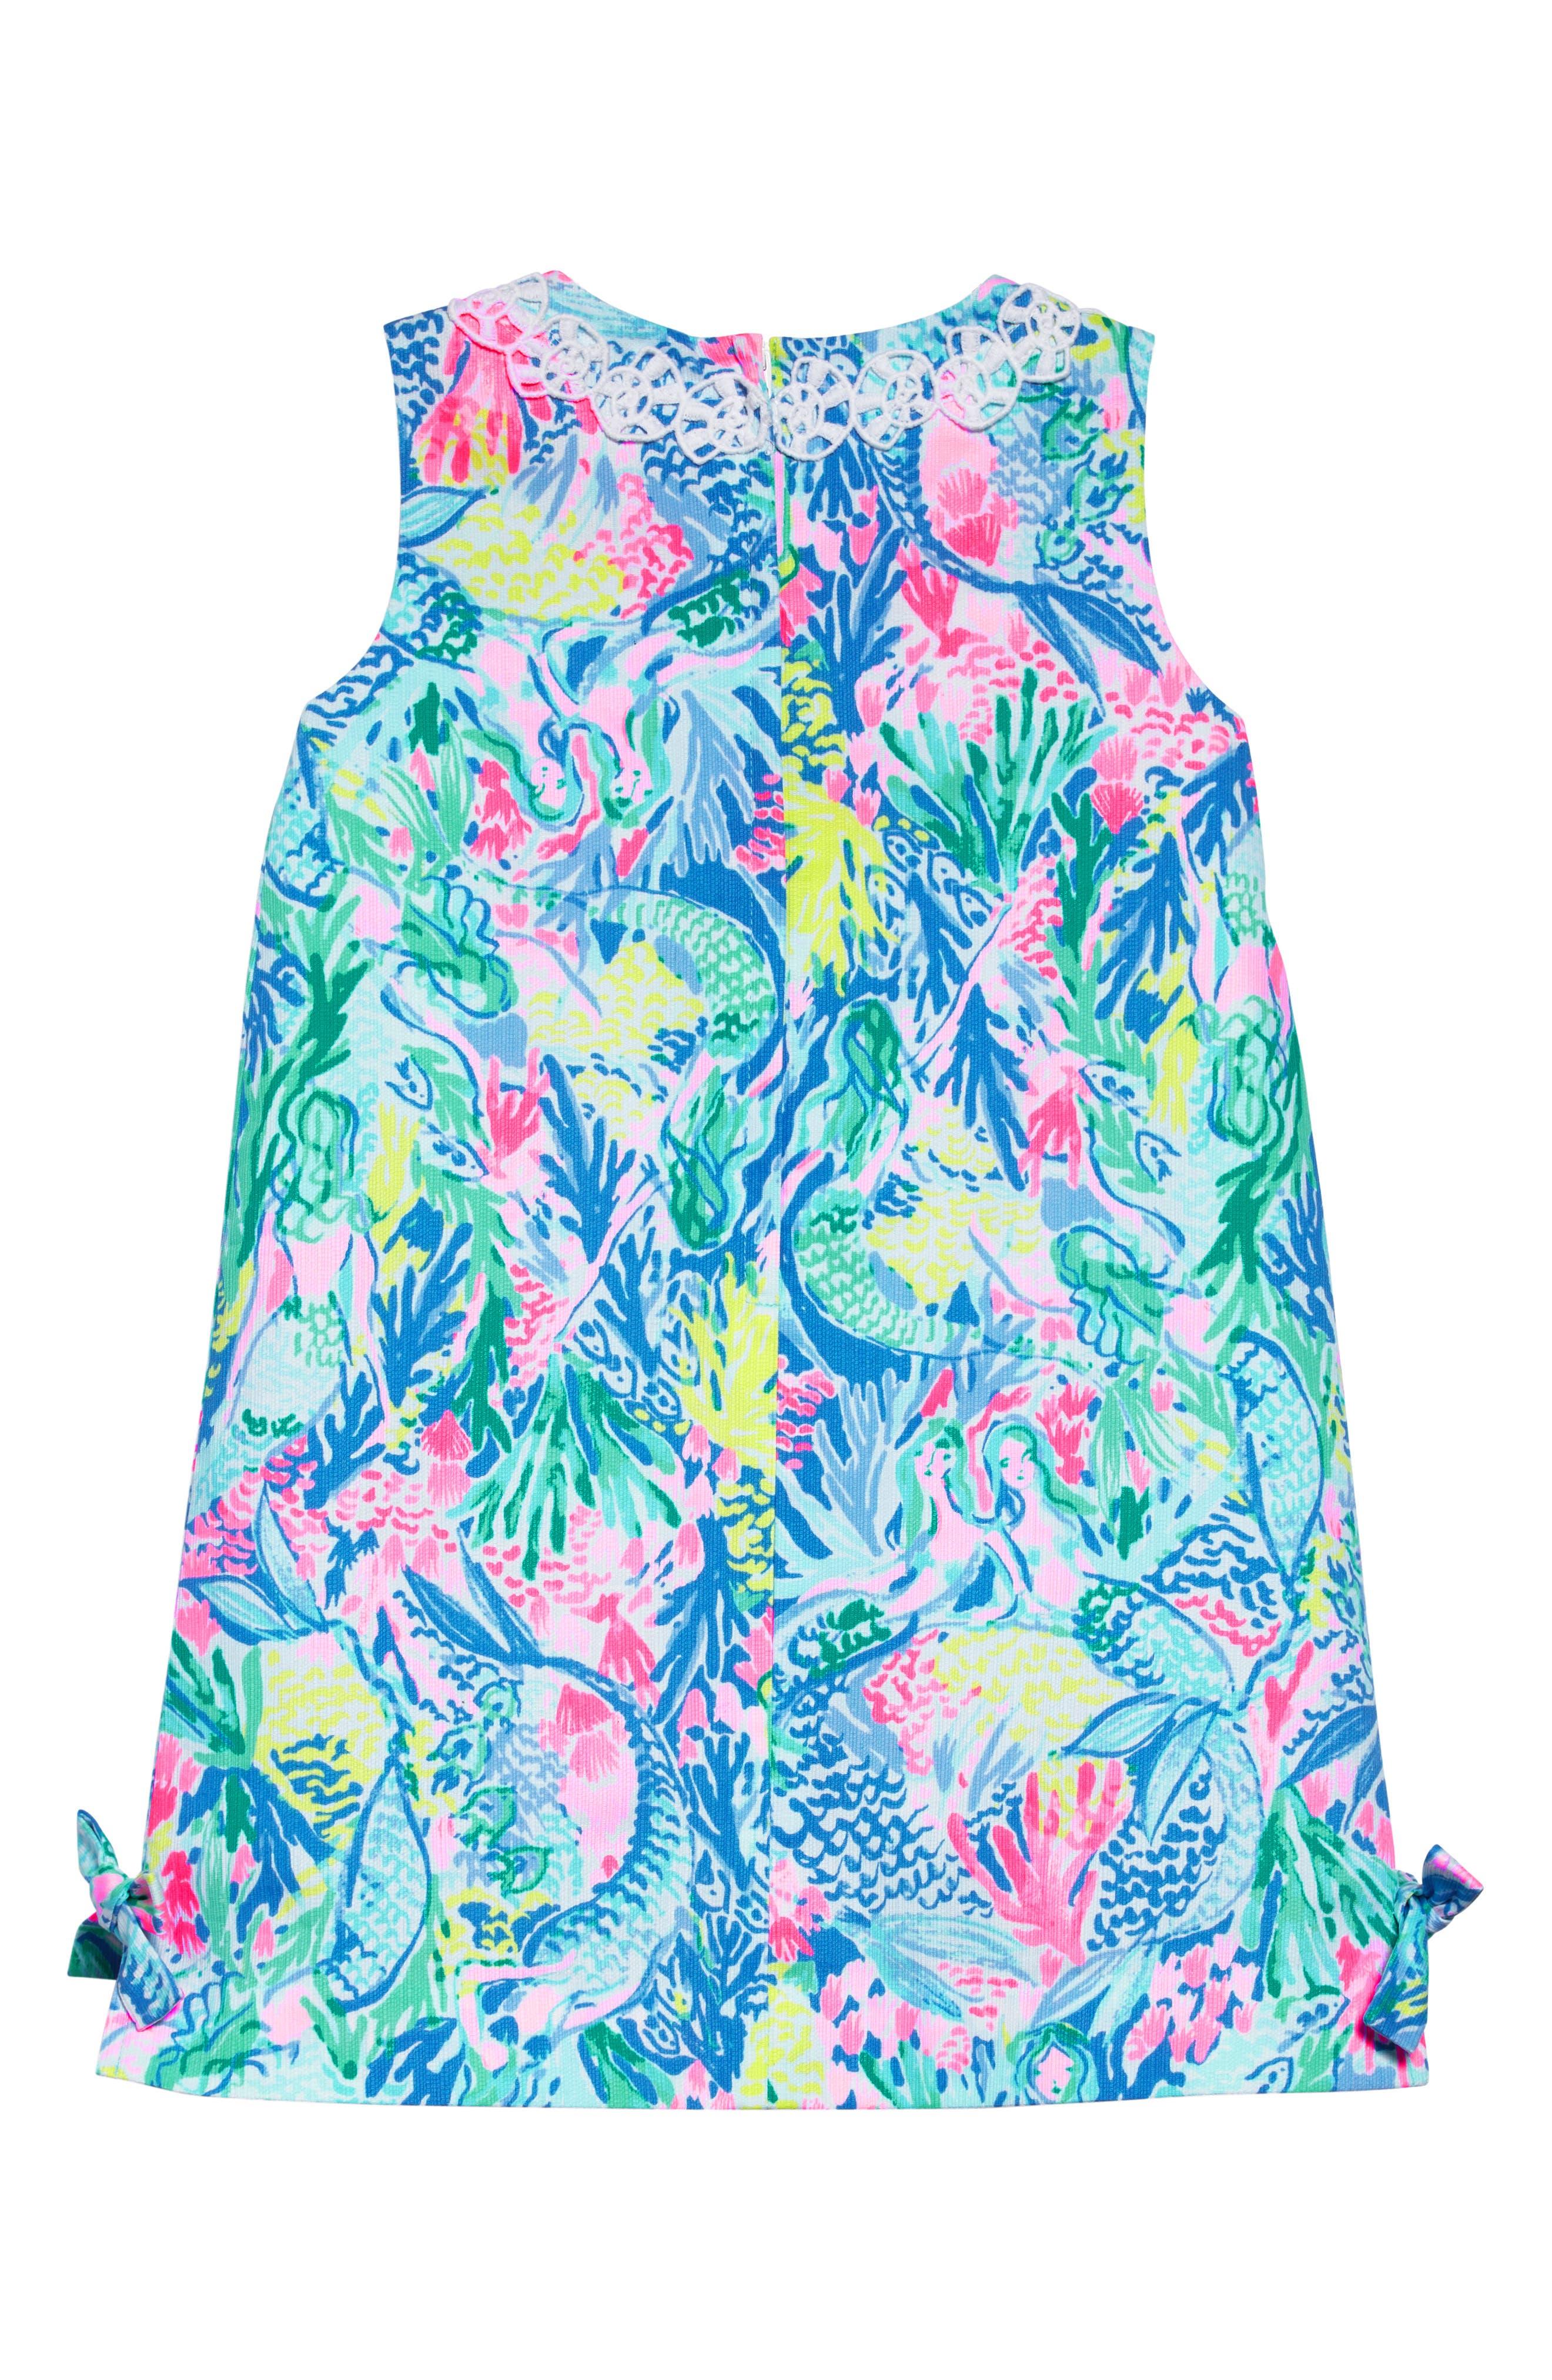 Little Lilly Classic Shift Dress,                             Alternate thumbnail 2, color,                             Multi Mermaids Cove